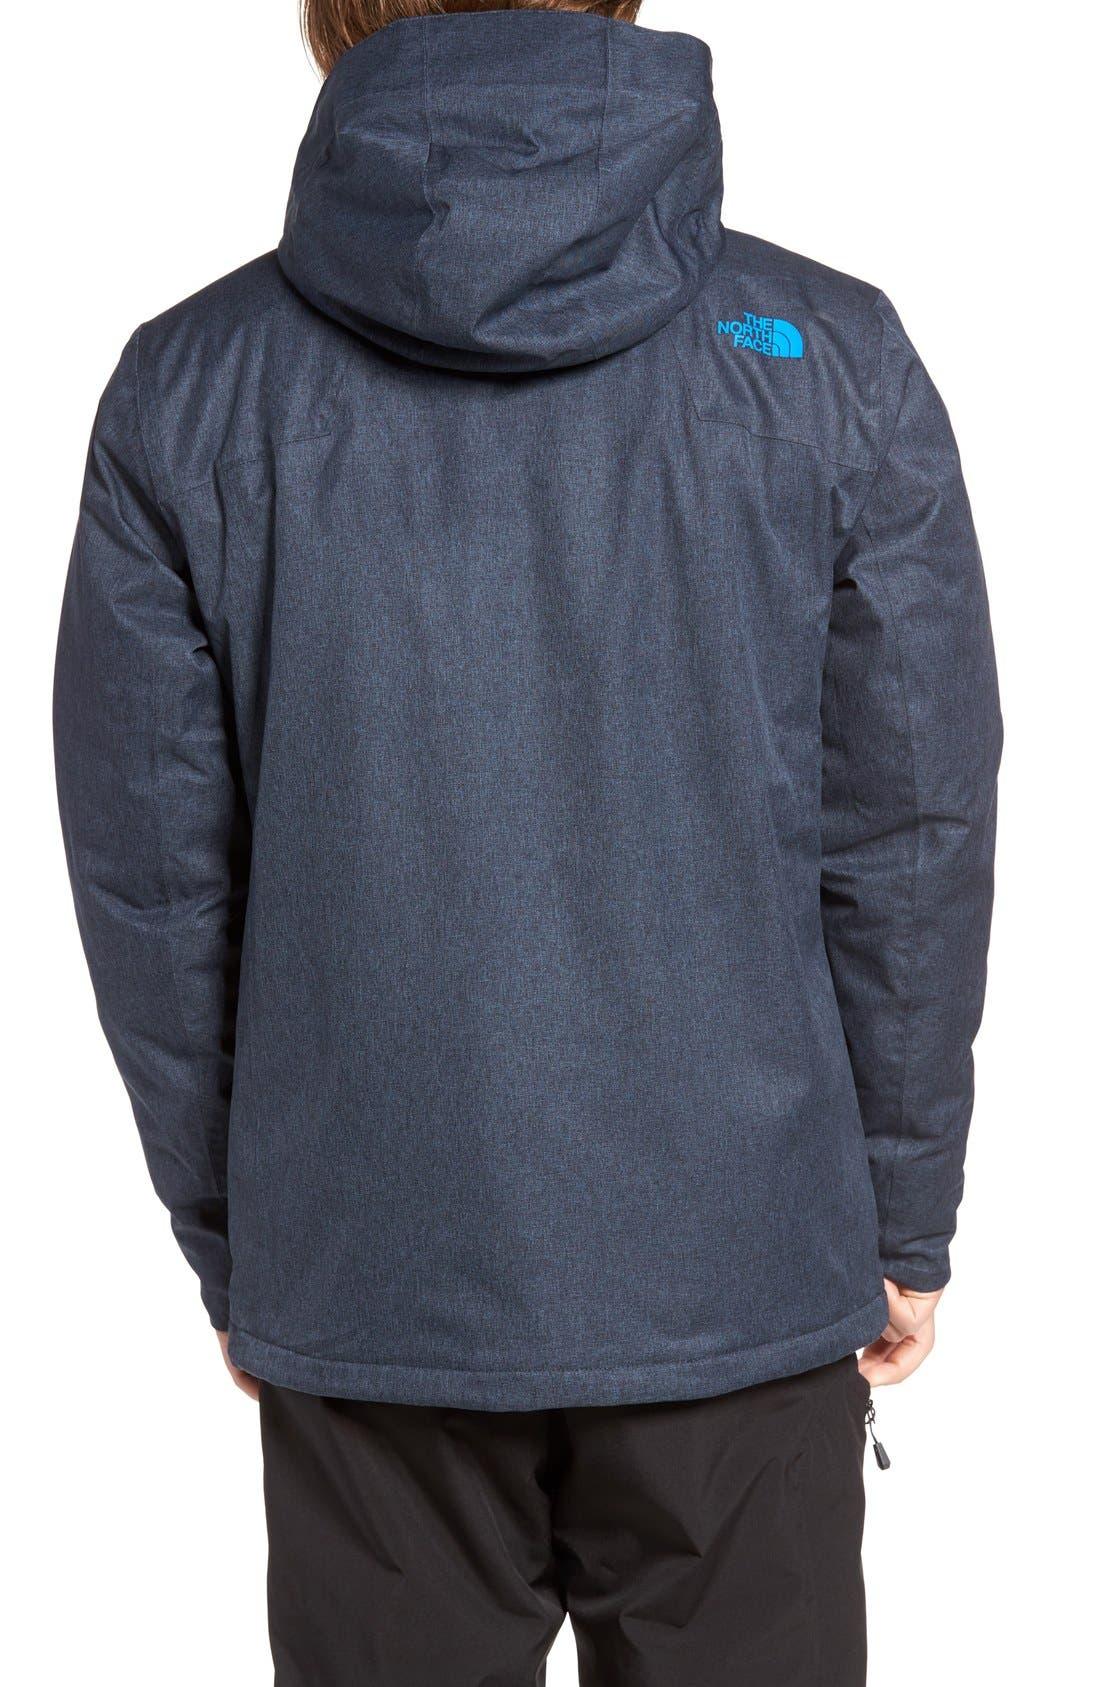 Alternate Image 2  - The North Face Powdance Waterproof Jacket